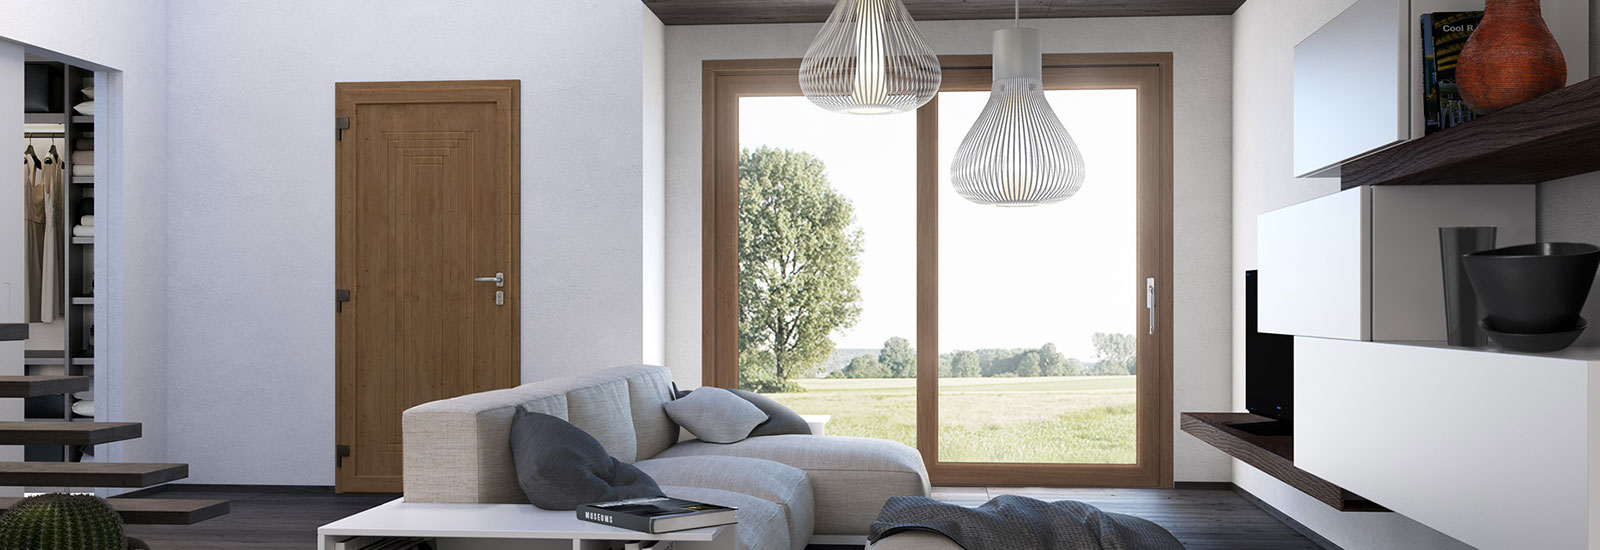 Stunning porta finestra scorrevole prezzi ideas for Mdb portas nurith